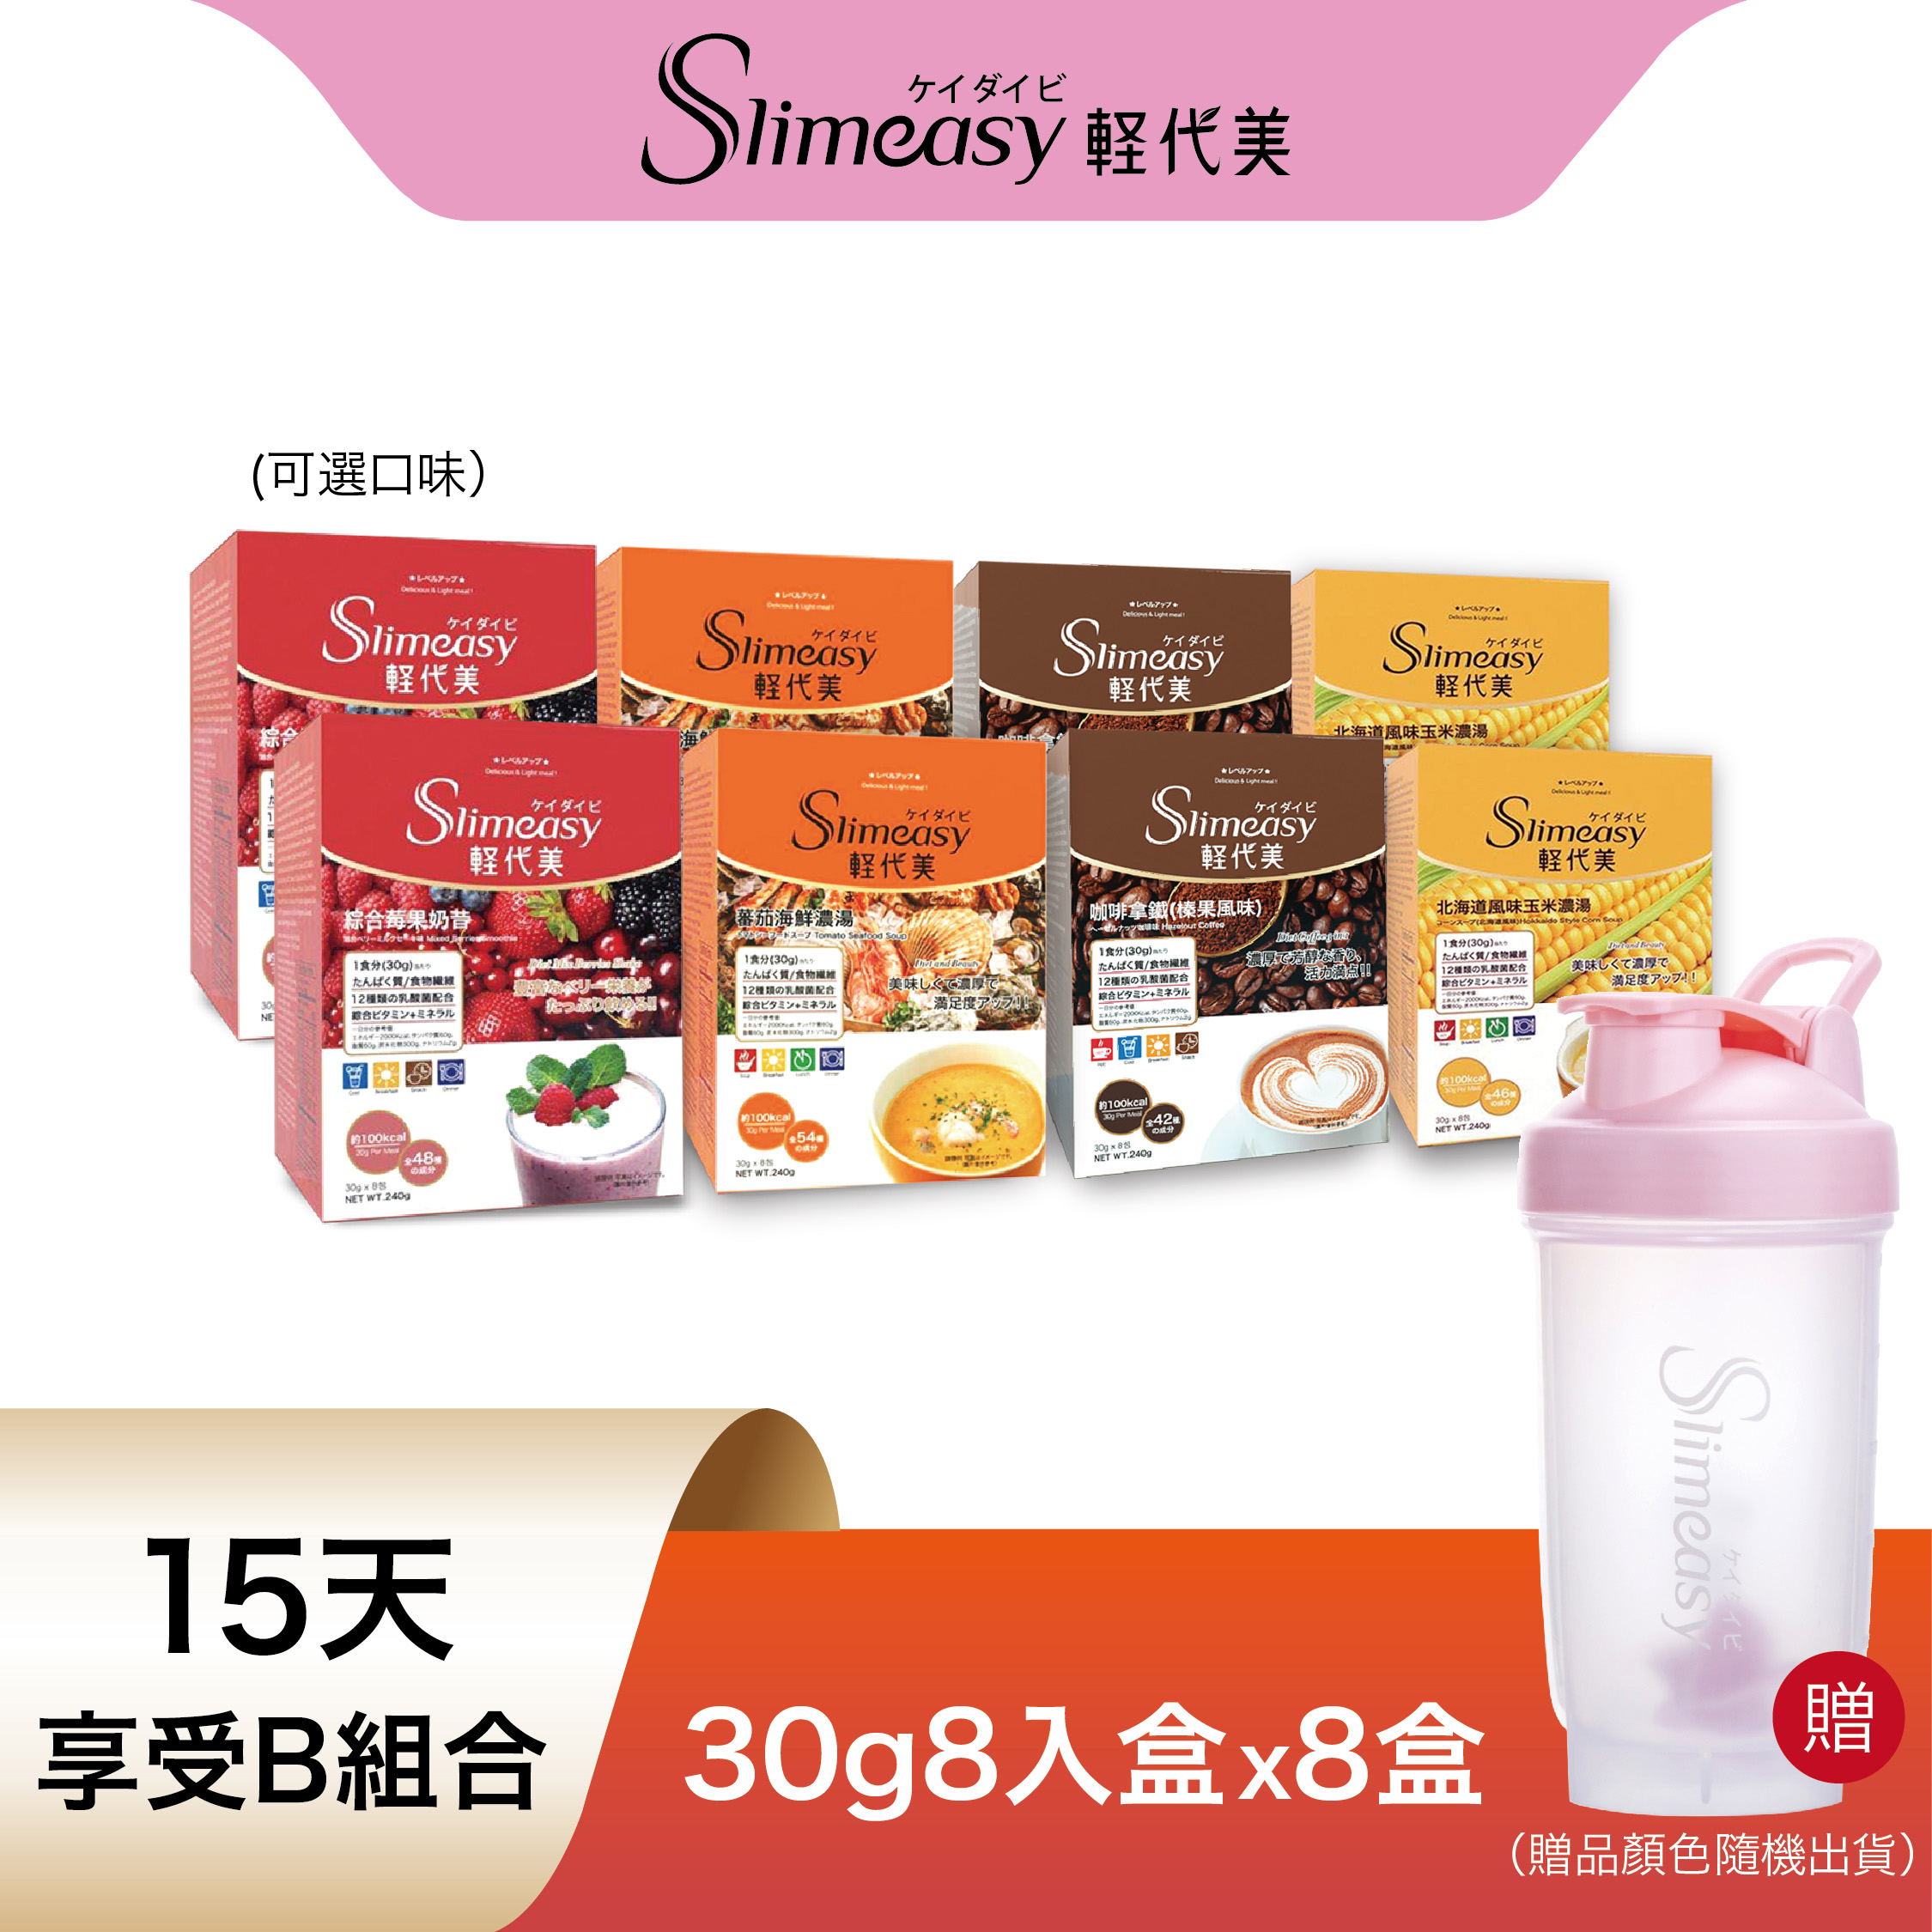 Slimeasy輕代美 營養代餐 15天享受B組合(贈送搖搖杯)